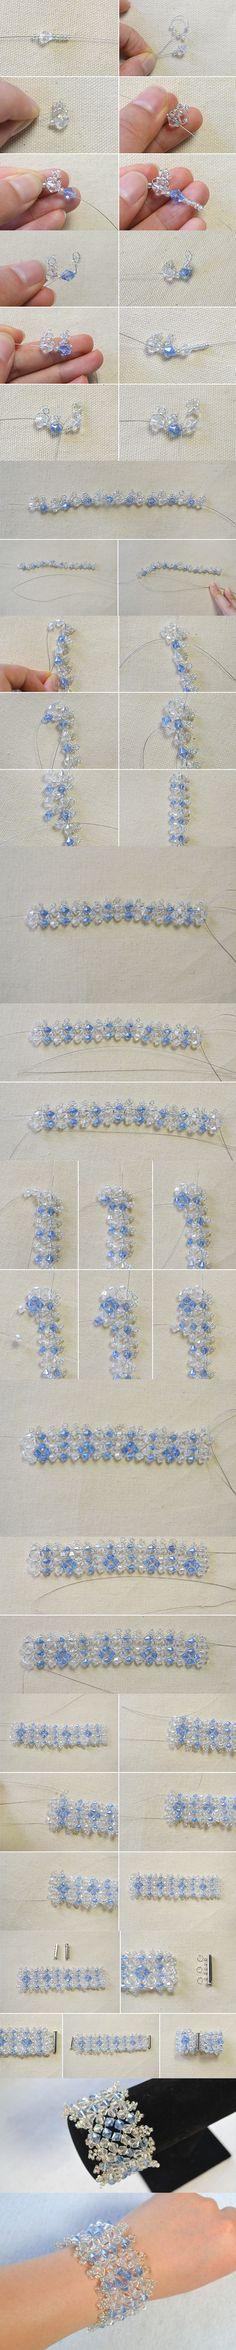 Beaded Bracelet Tutorial-How Do You Make a Crystal Beaded Bracelet from…